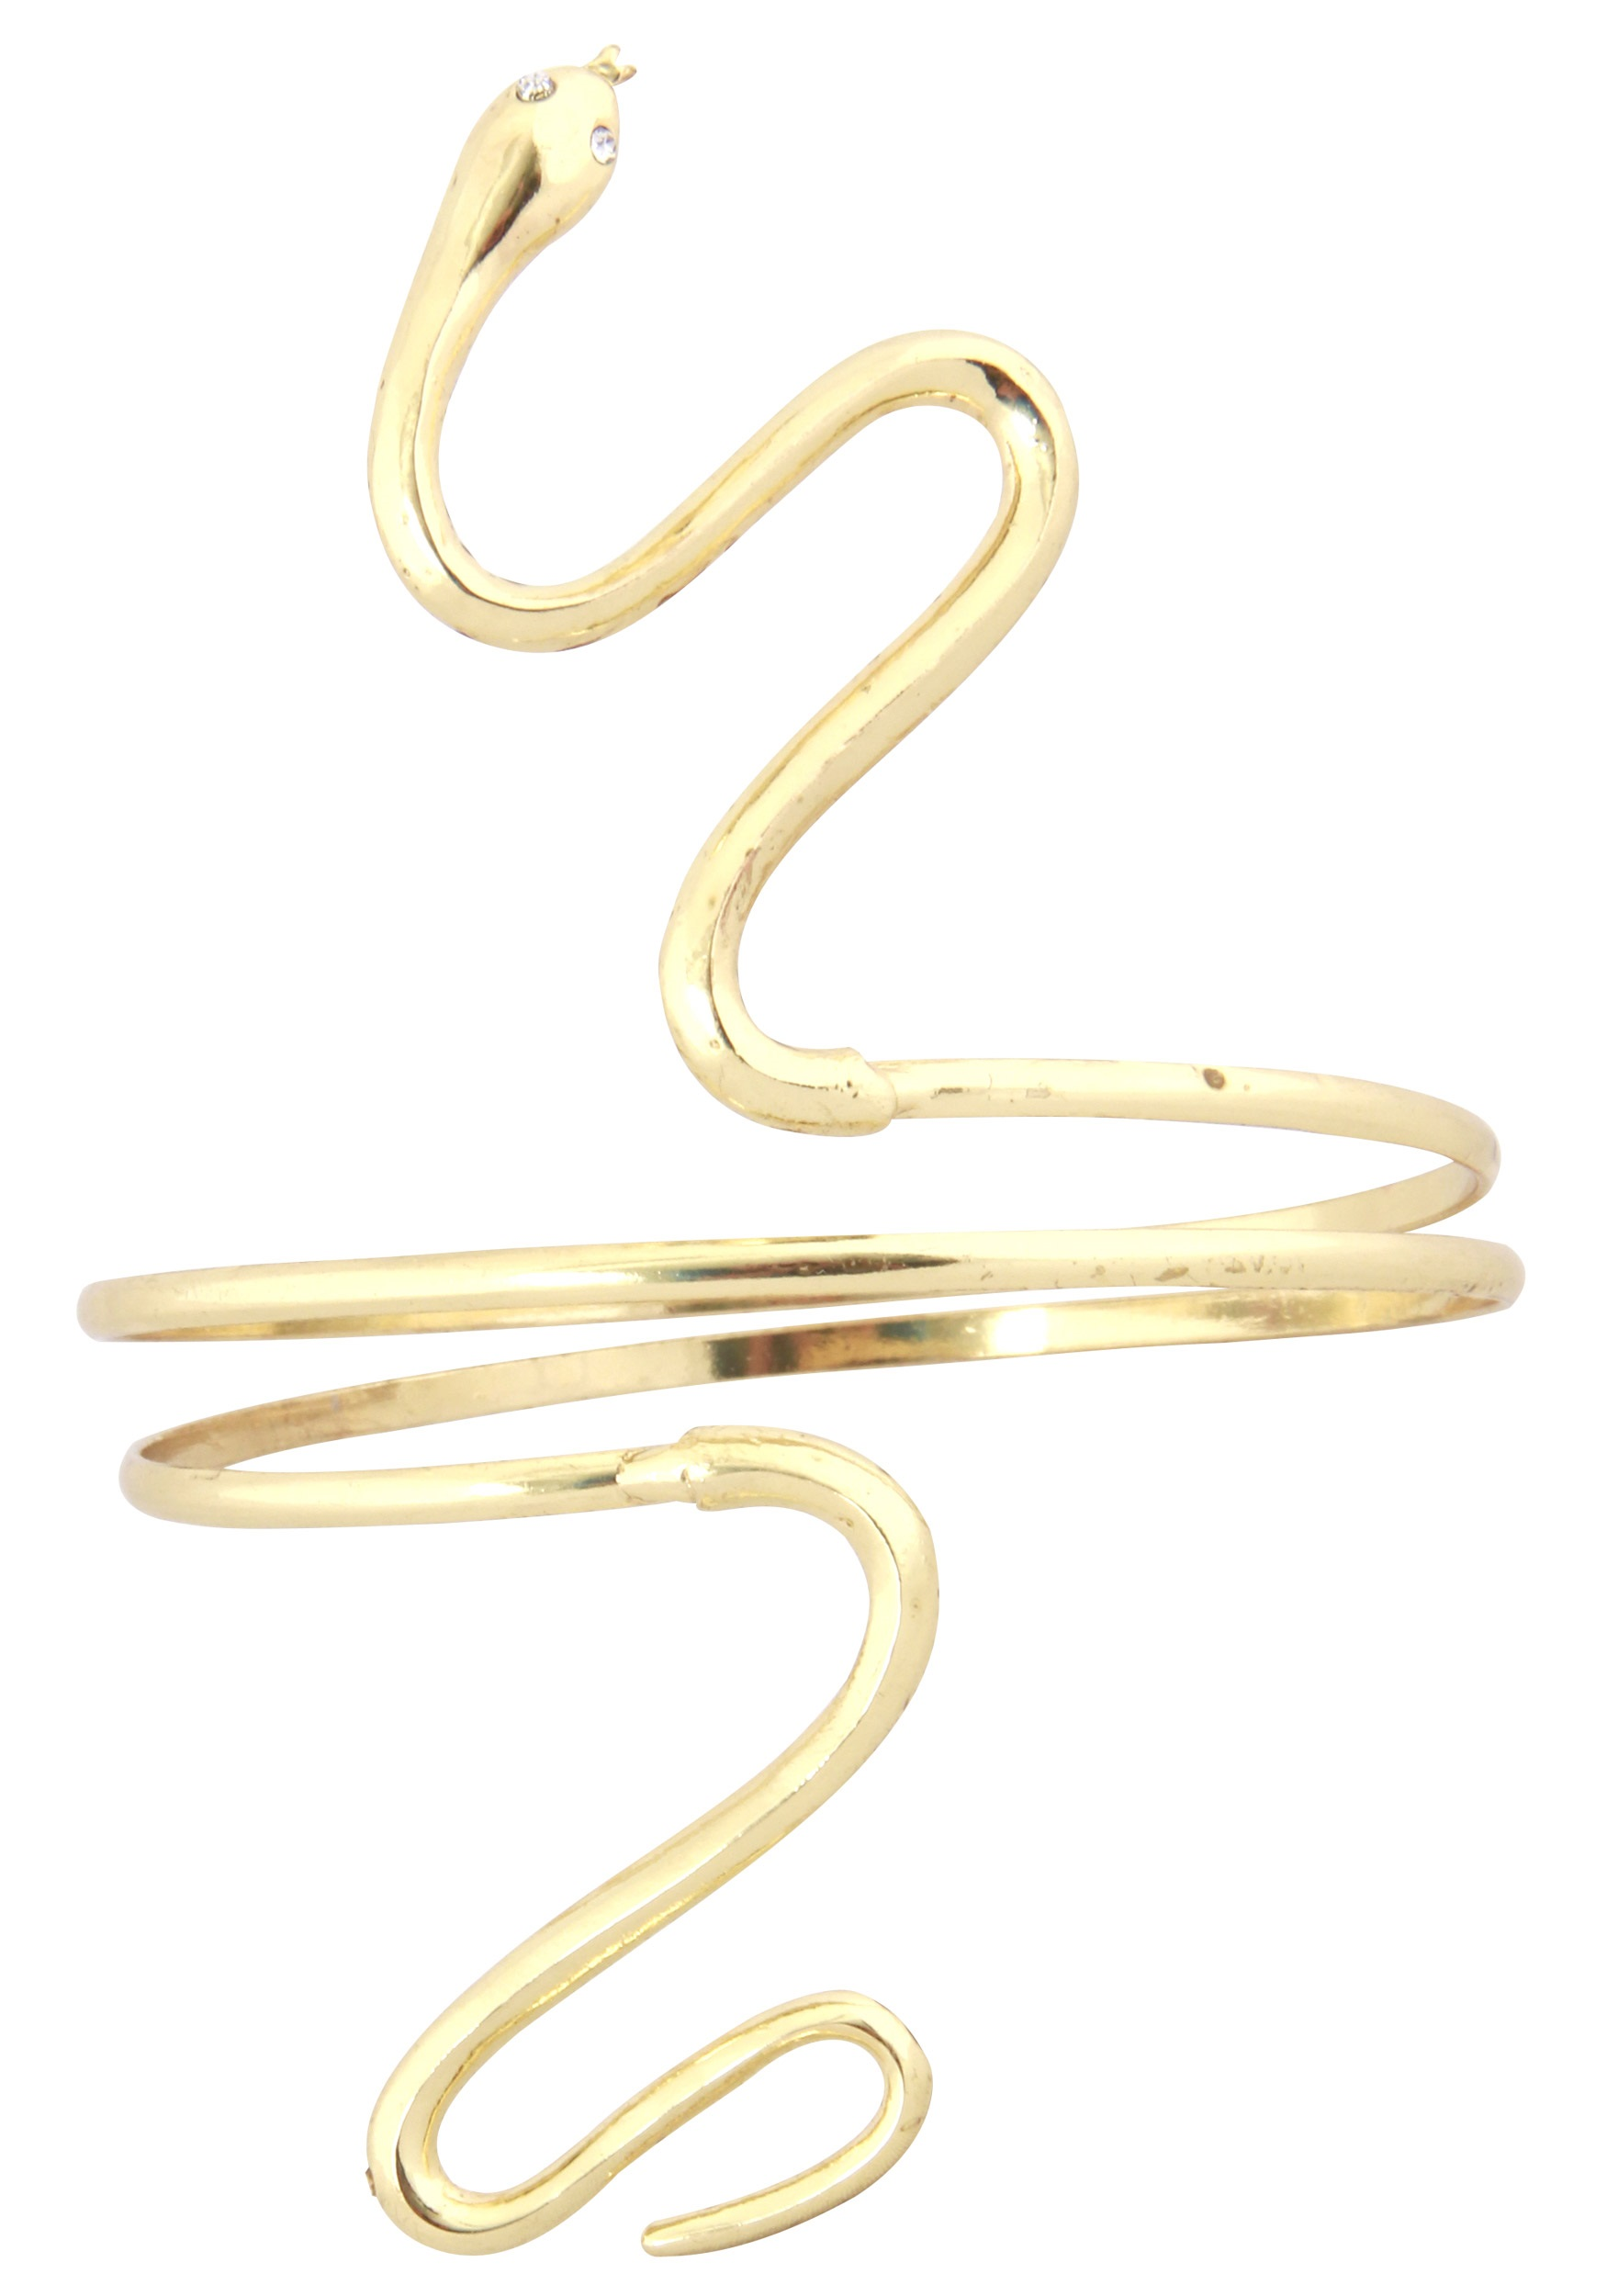 Lady Cleopatra Egypt Queen Medusa Fancy Dress Accessory Golden Snake Armband UK